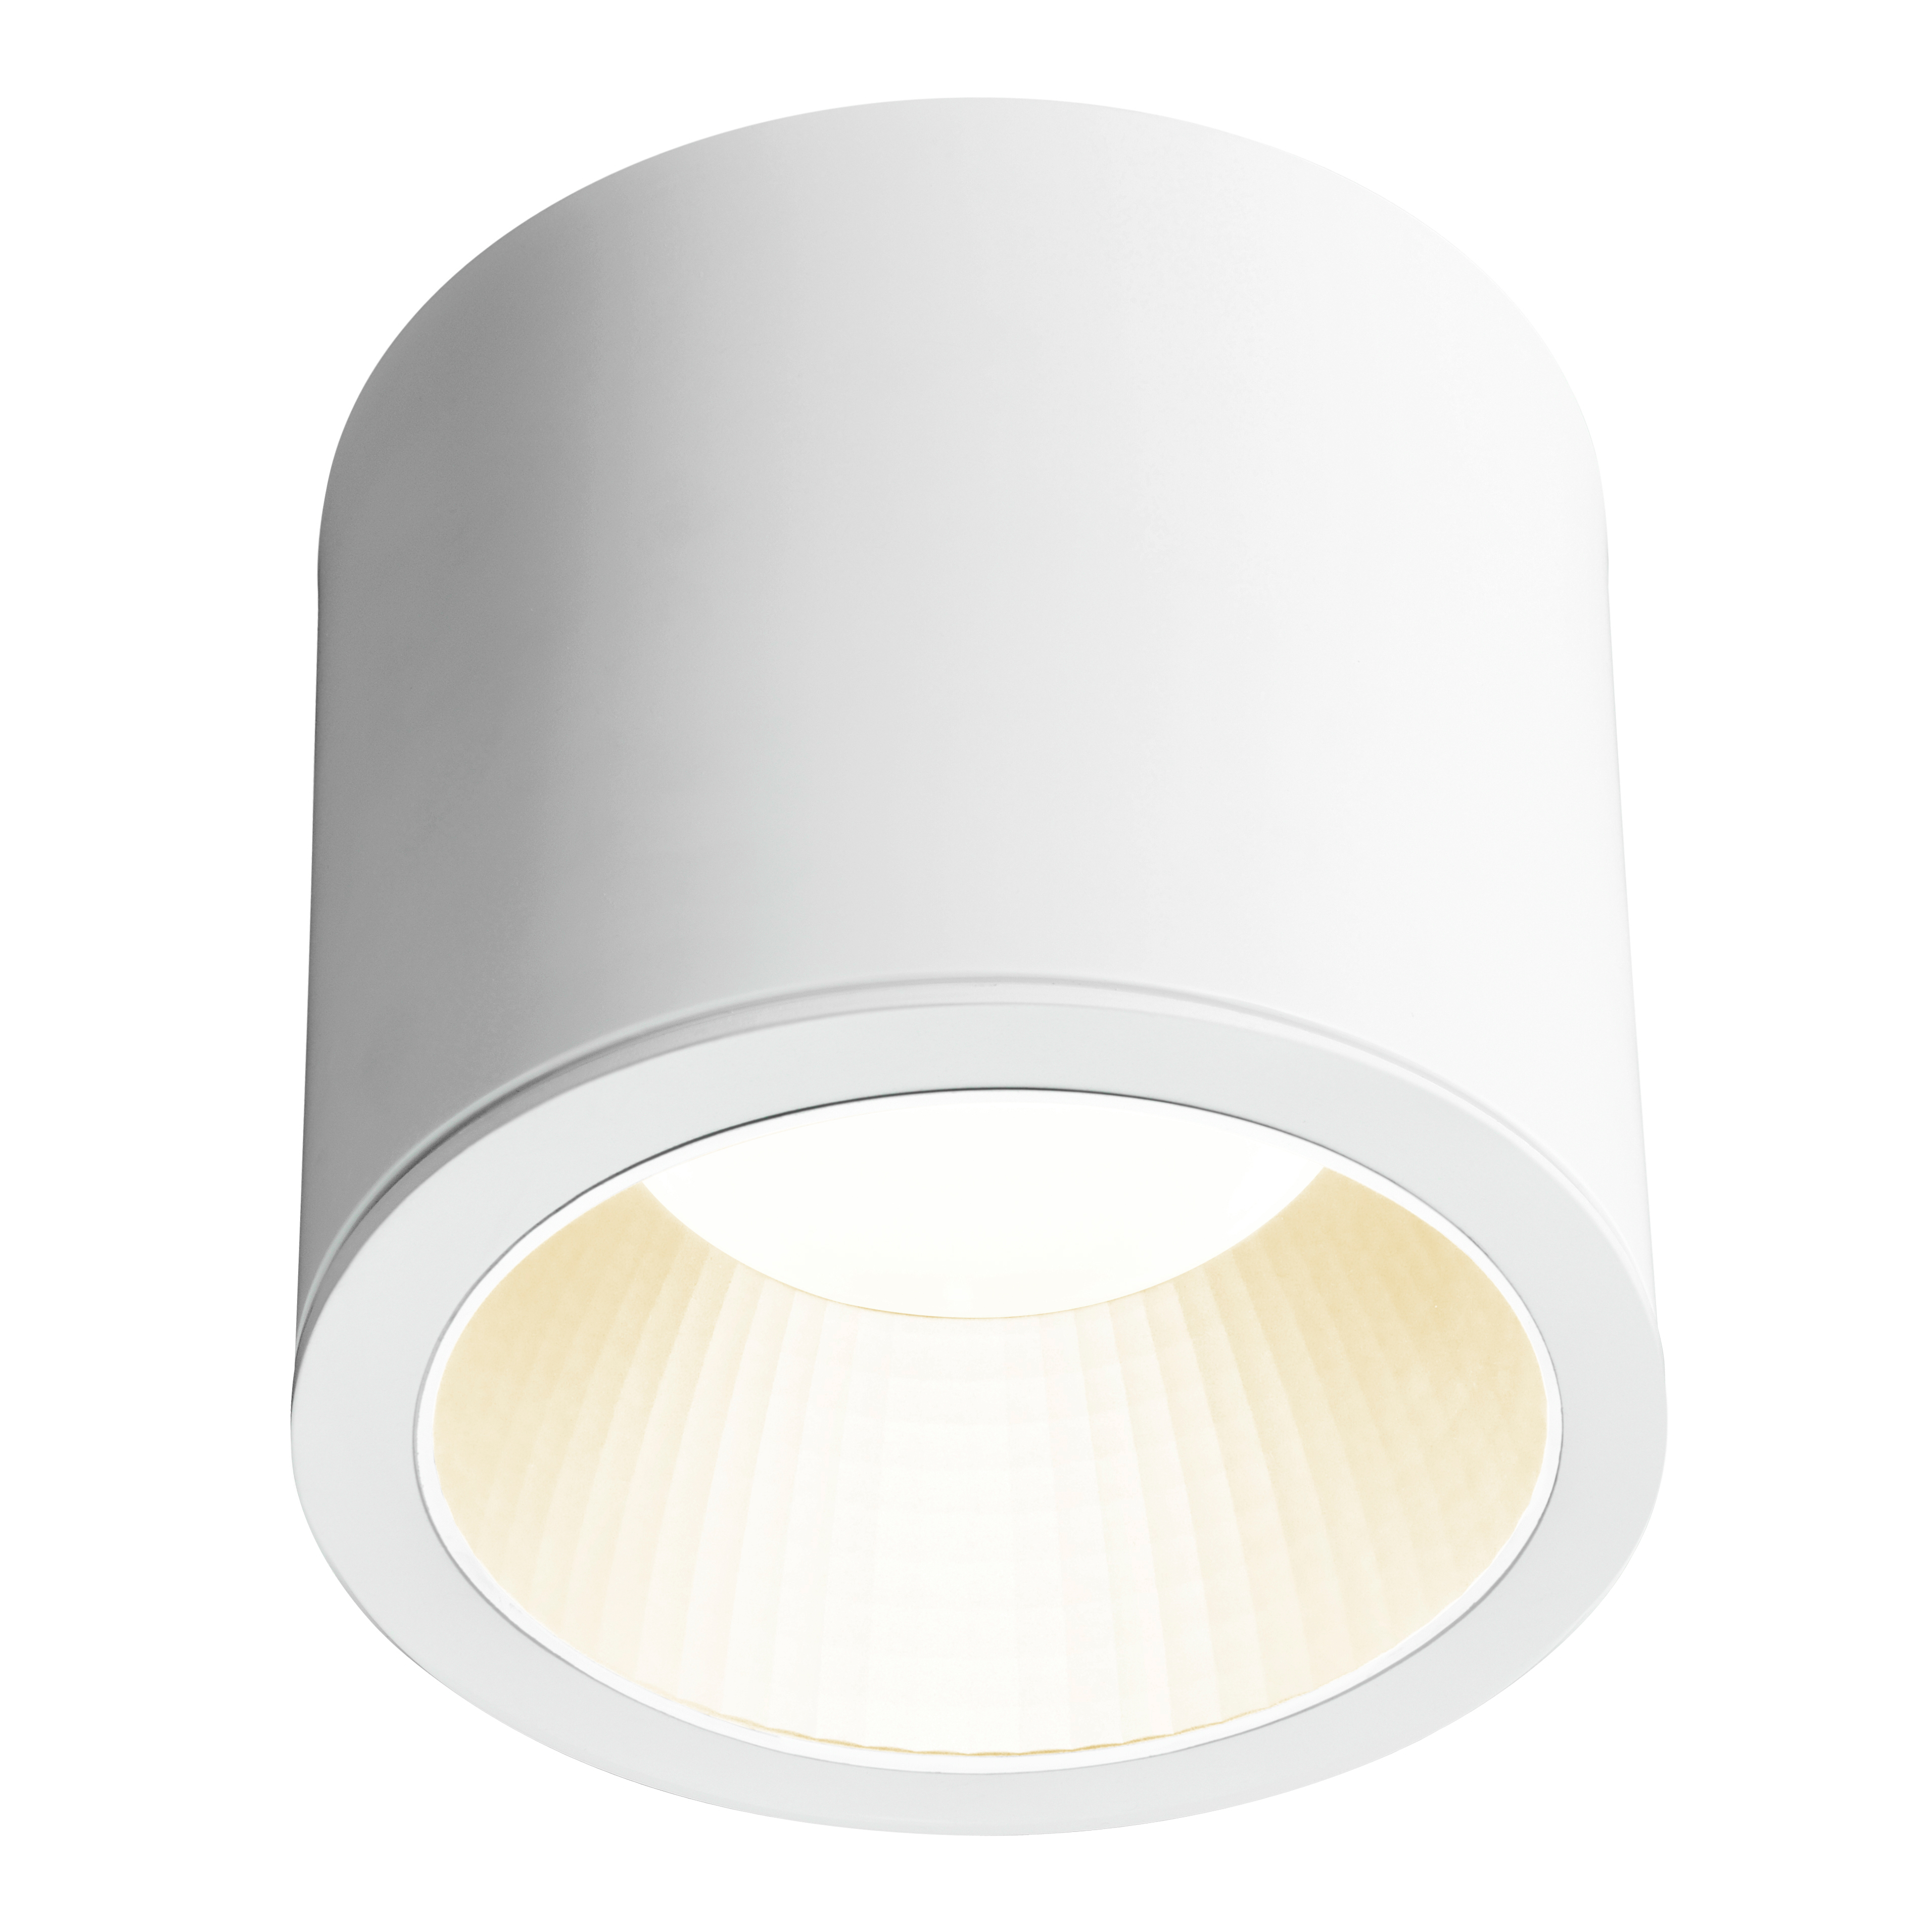 SOLINA 242 LED 18W 1900lm/840 MAT IP20 70° weiß GEN.2